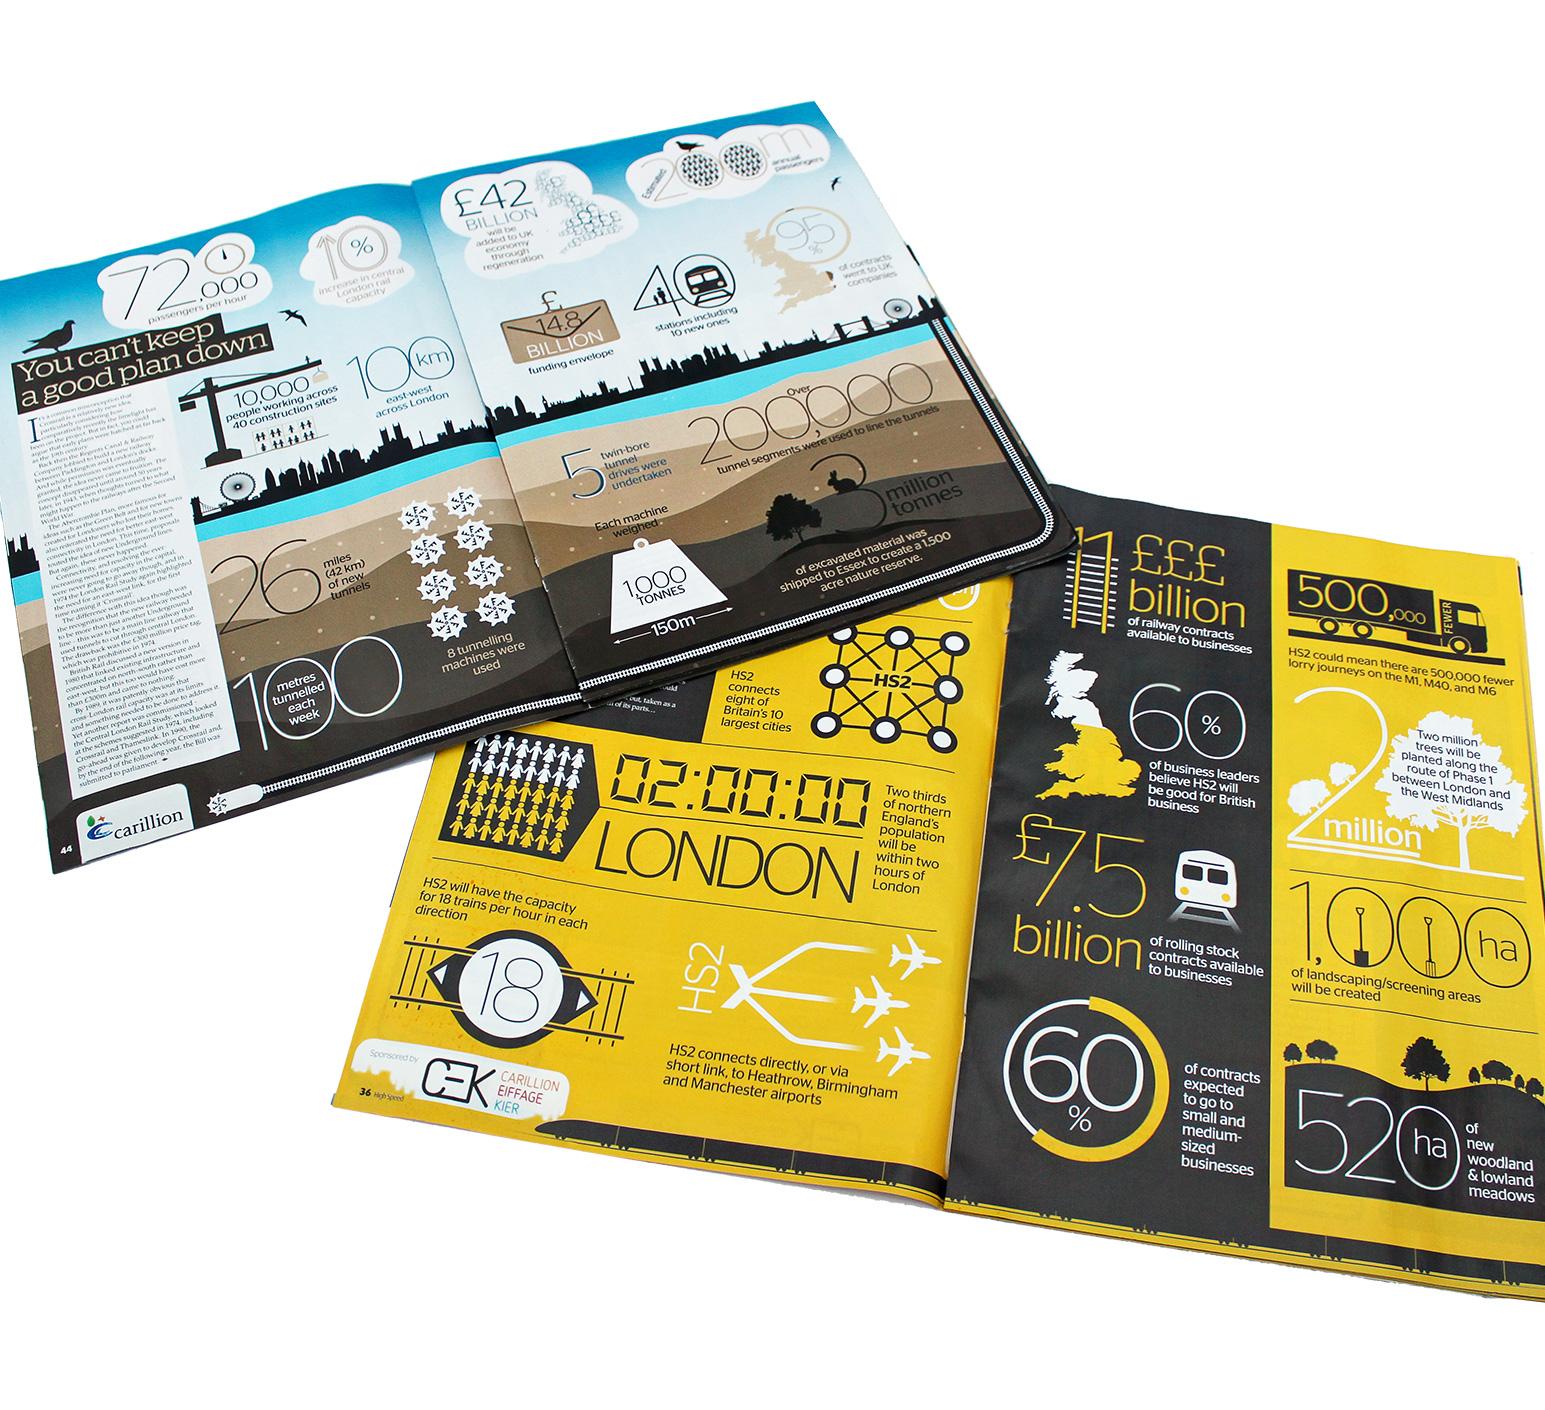 infographic, print, magazine, RAIL, graphic design, sparx creative